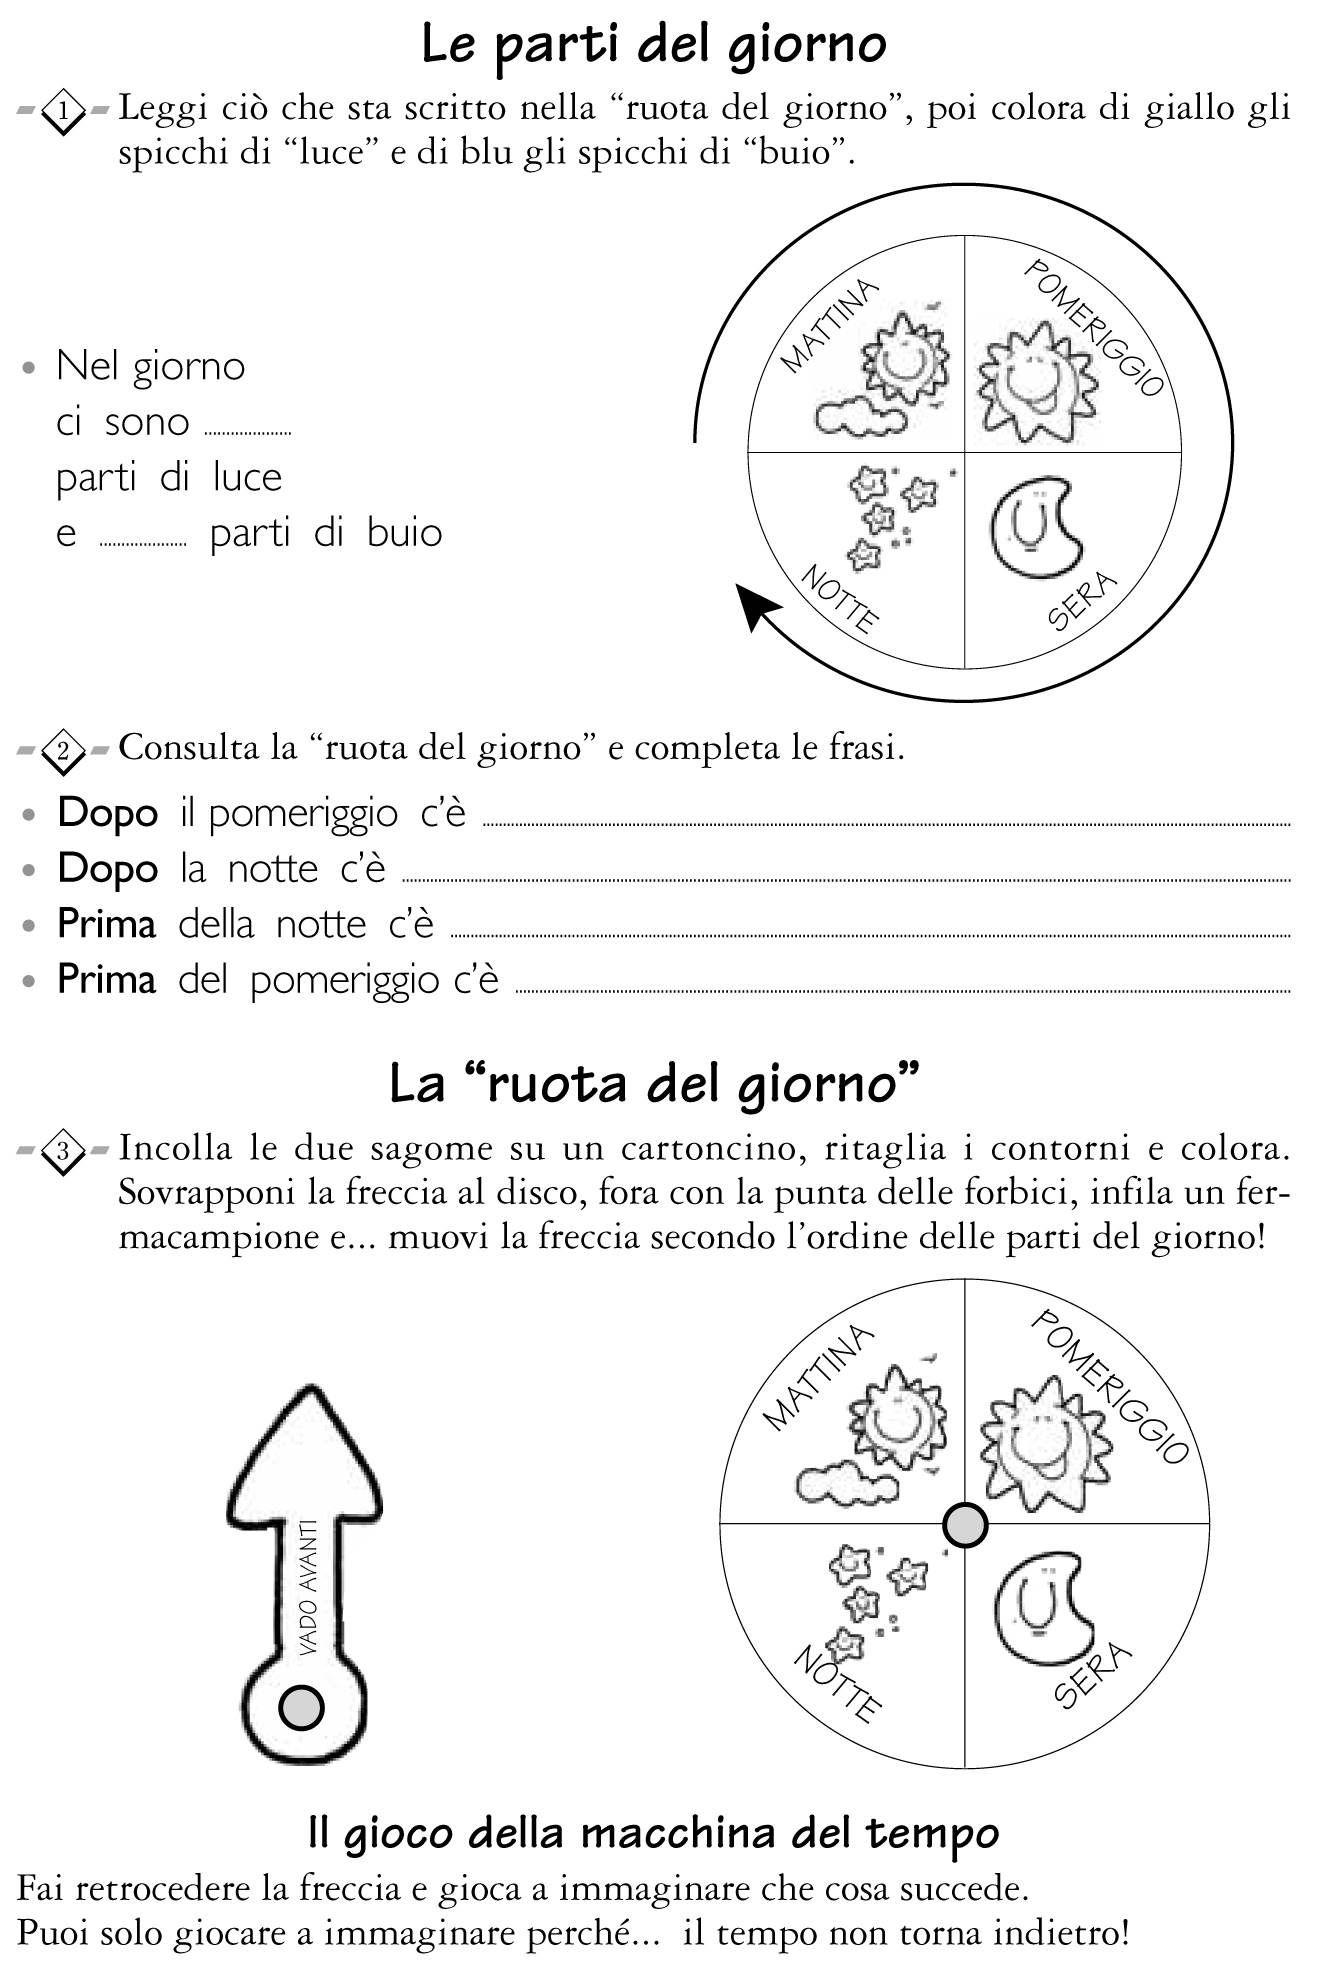 Storia Maestro Cris Teaching Italian Pinterest Storia